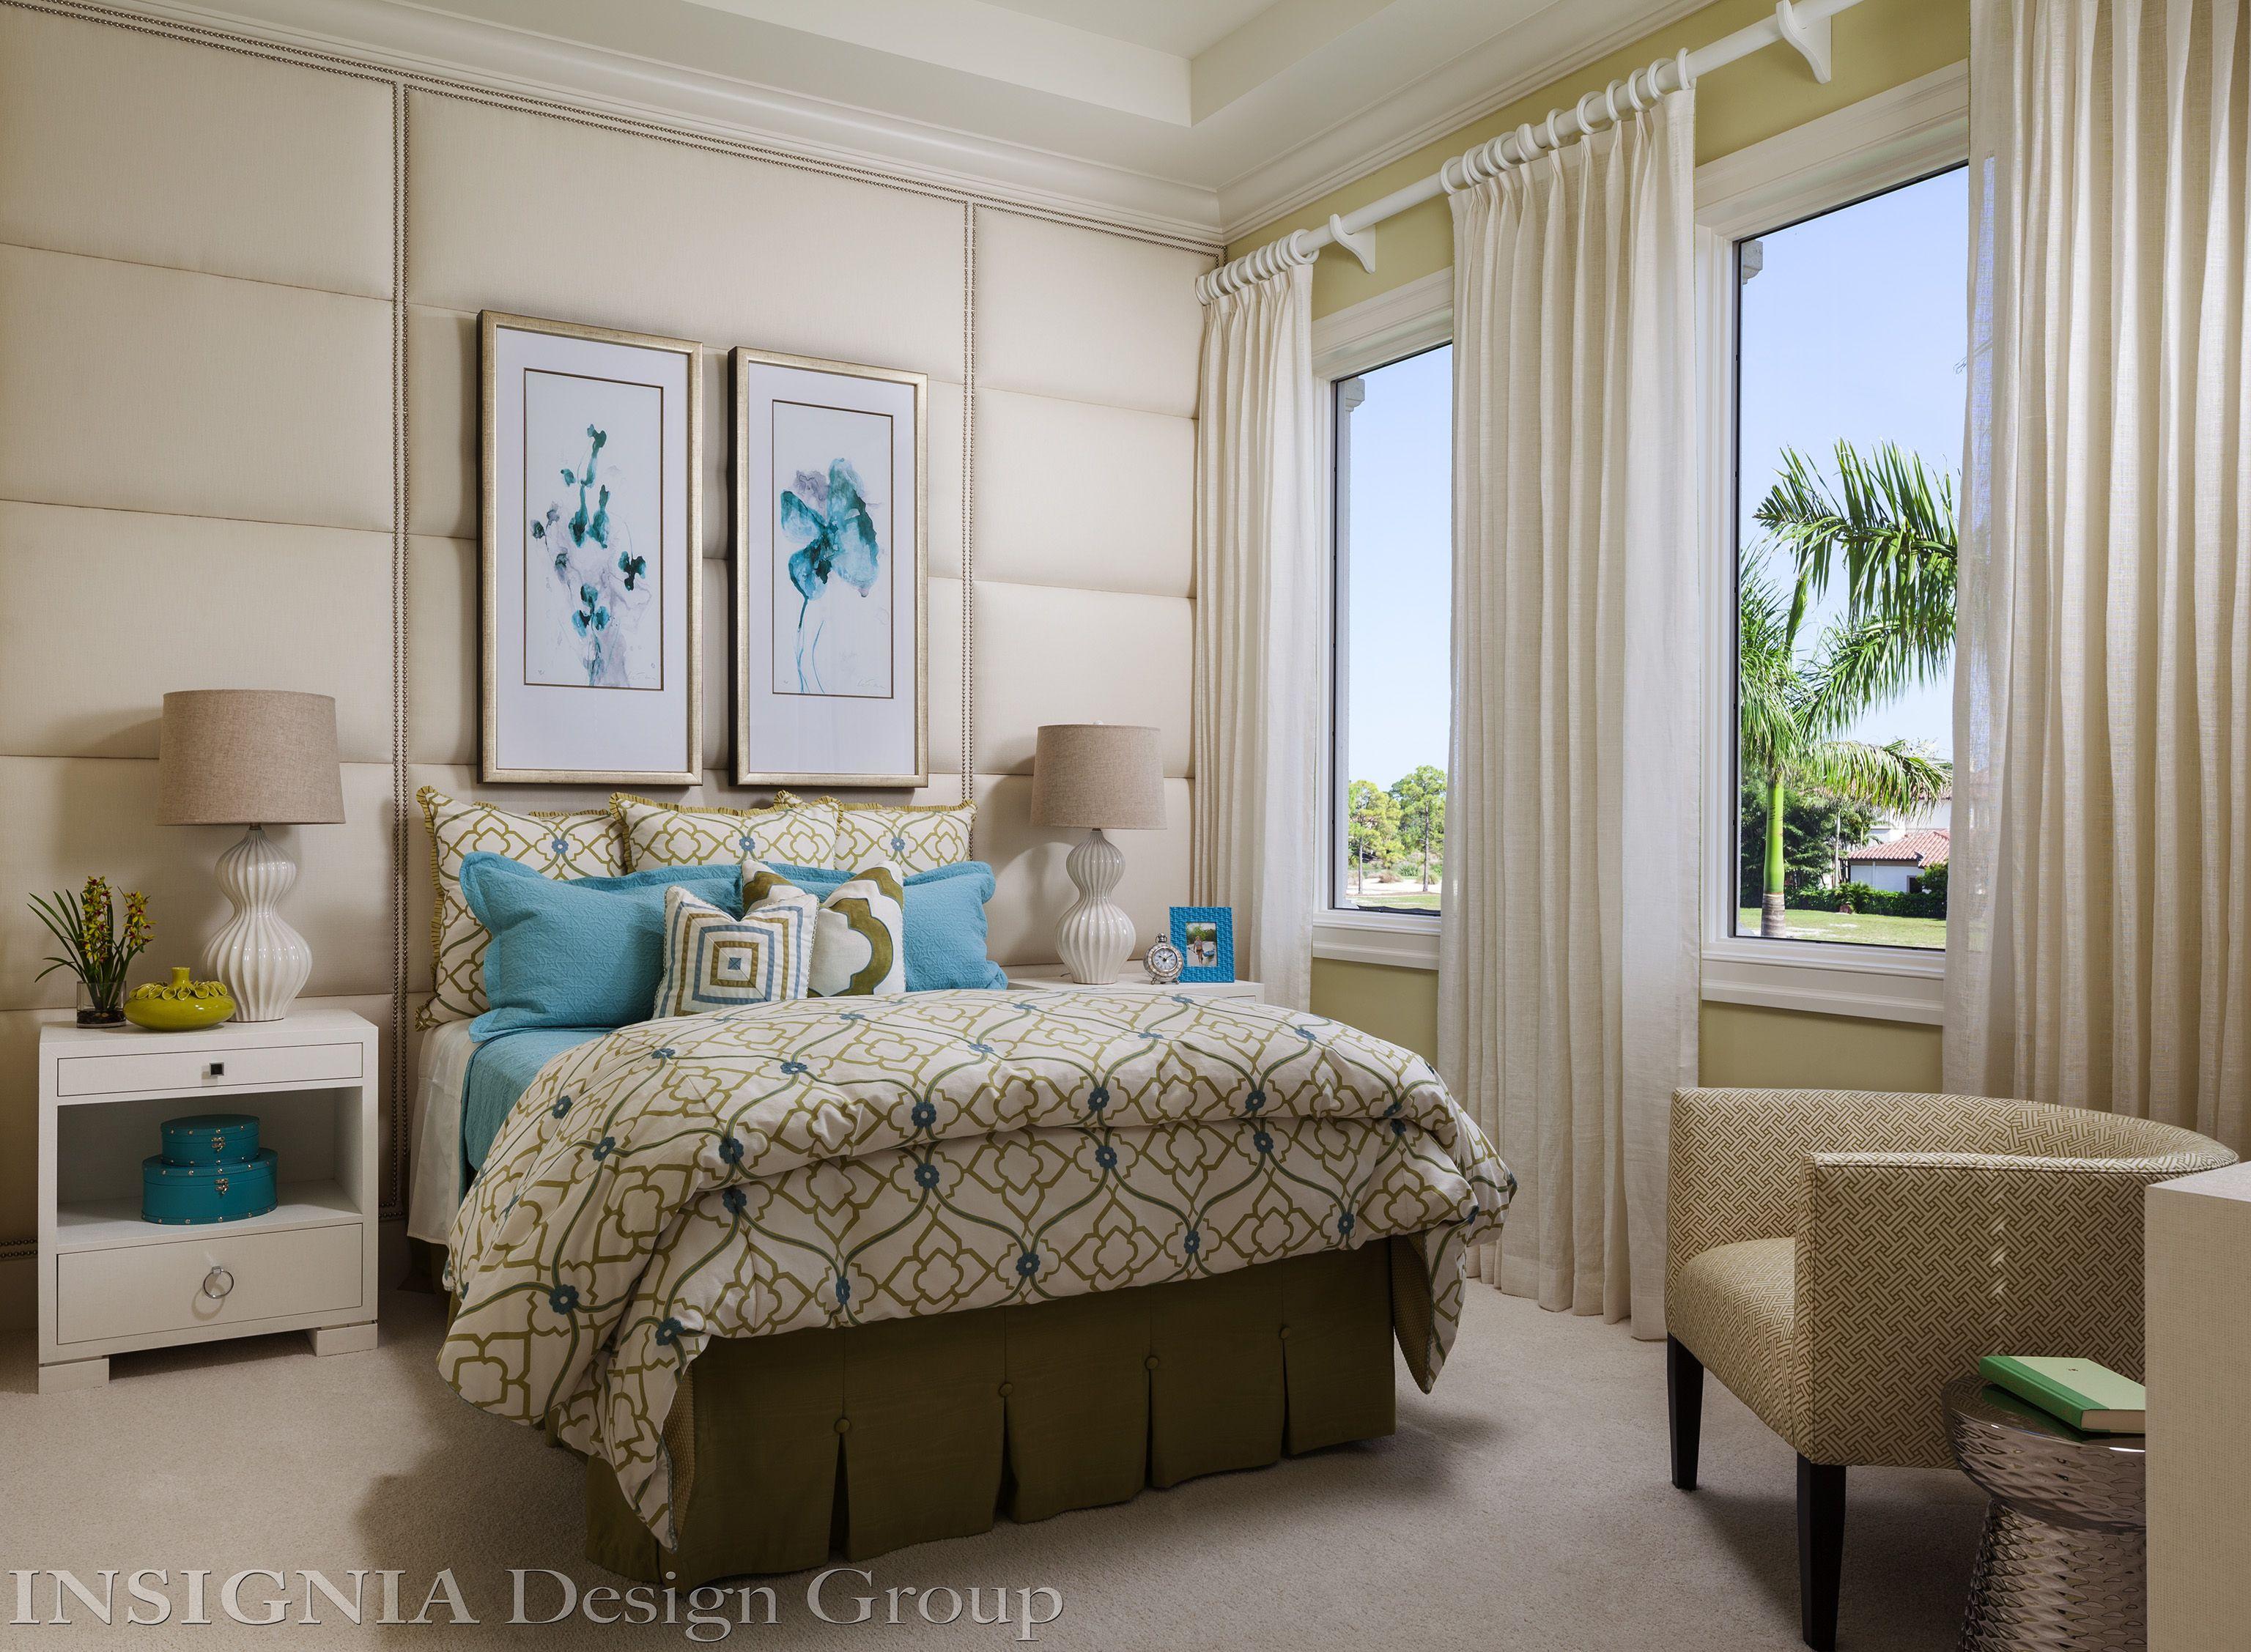 guest room. Upholstered walls, Home bedroom, Interior